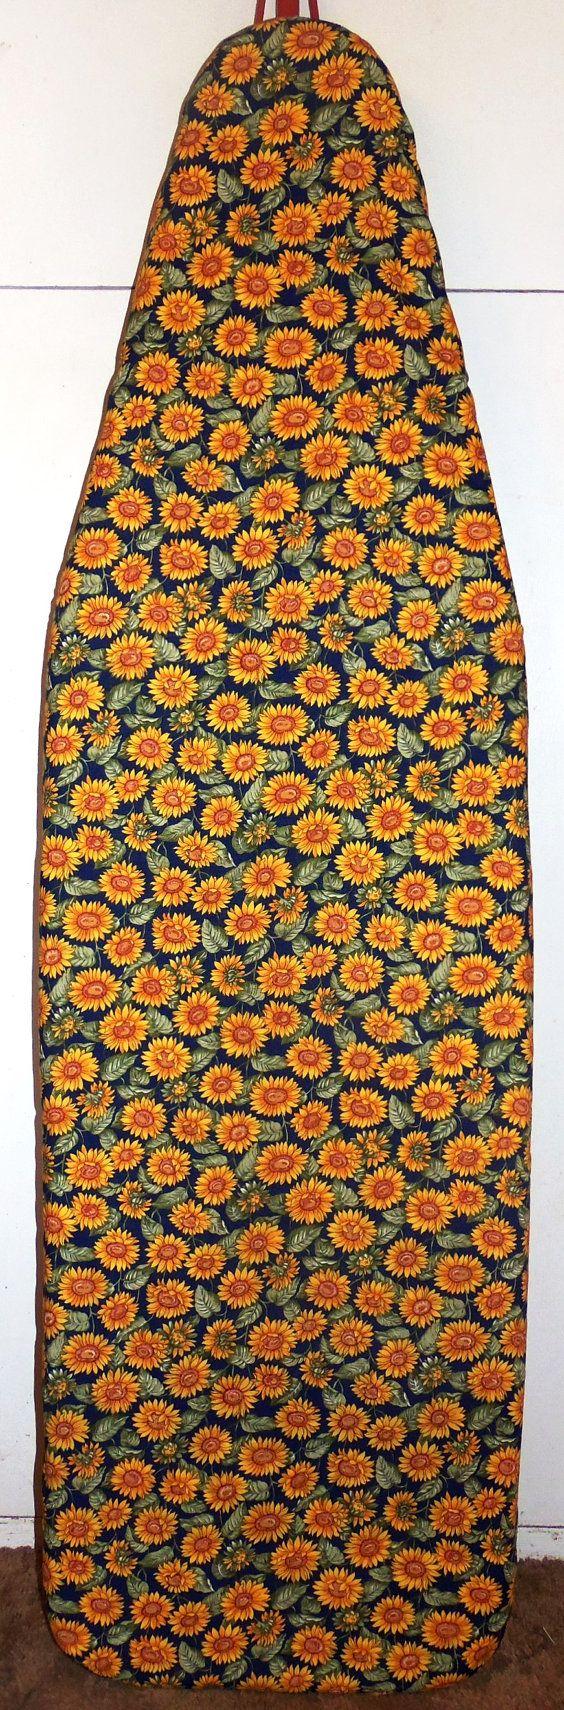 Sunny flowers - Farmhouse Ironing board